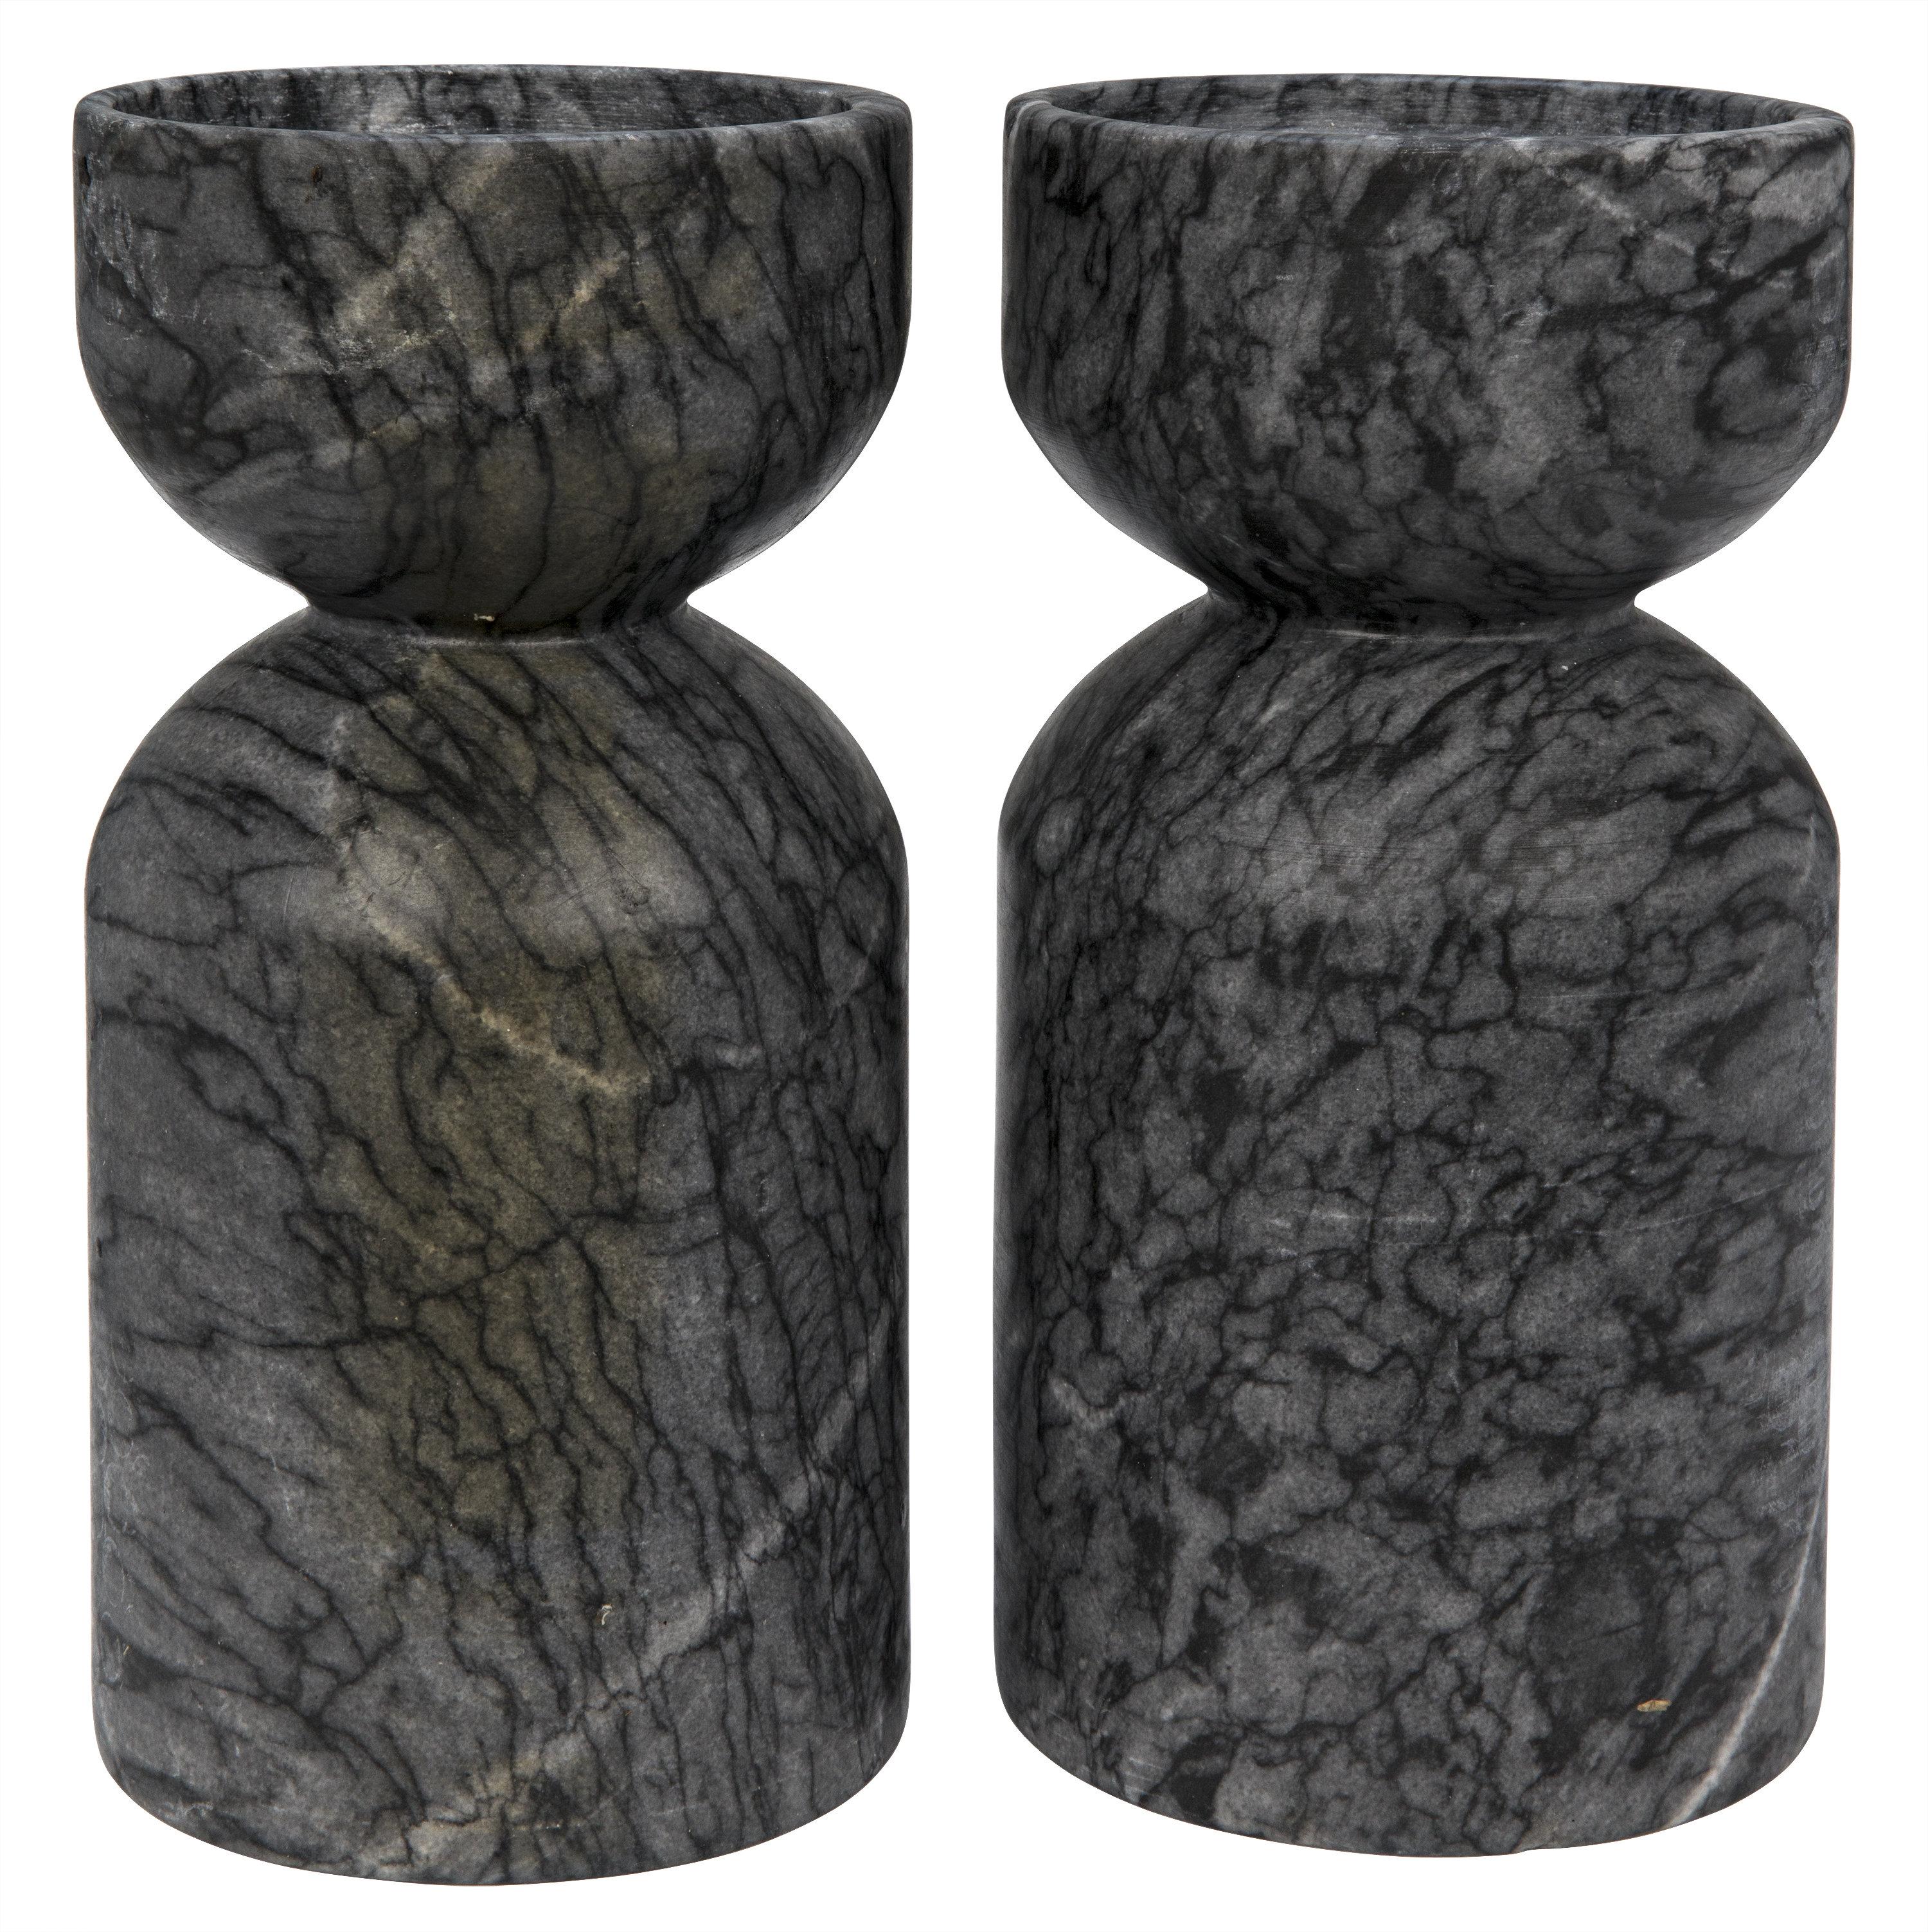 Noir Elias 2 Piece Stone Tabletop Candlestick Set Perigold